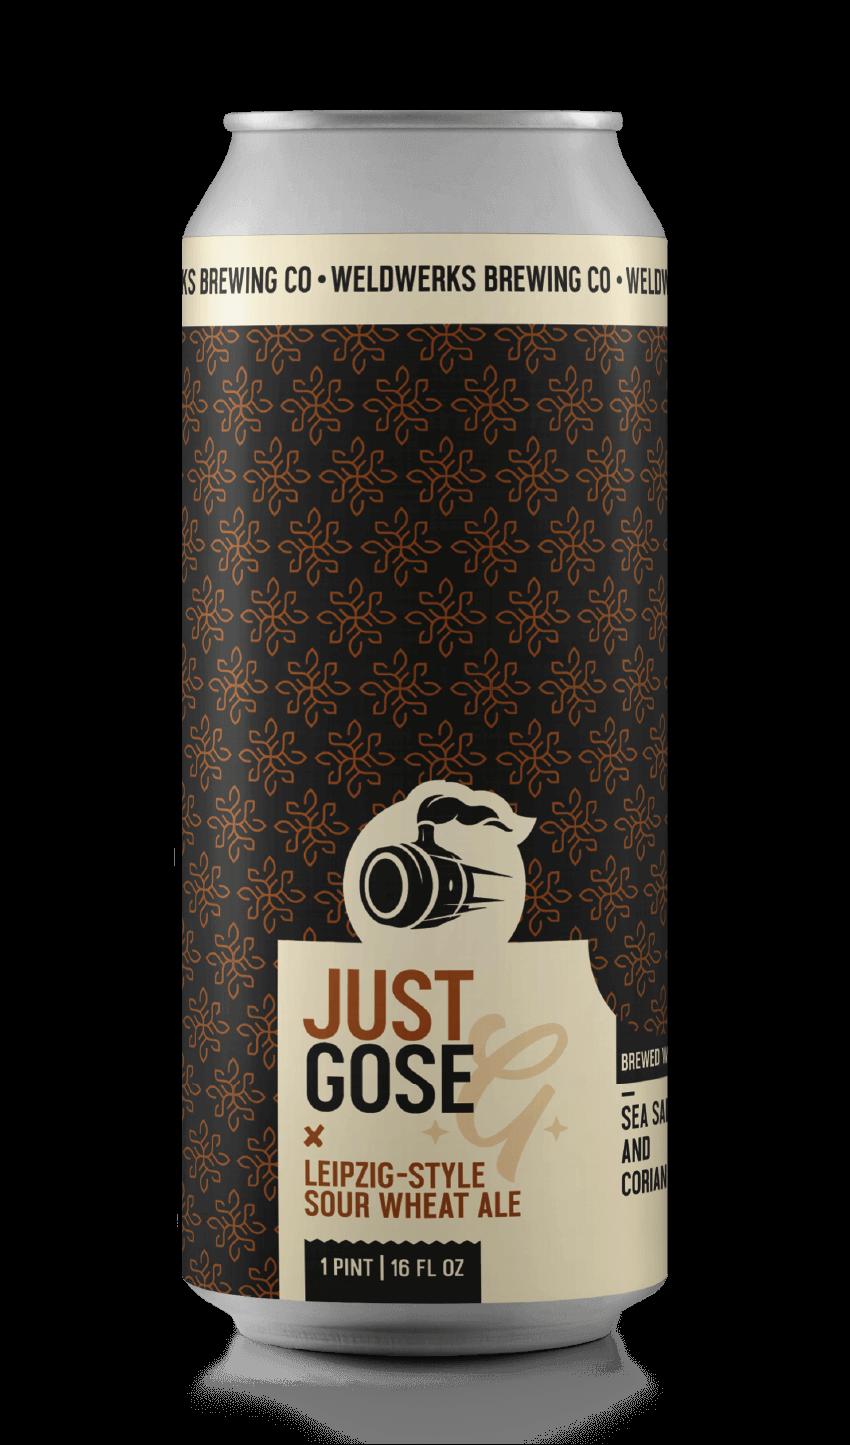 Just Gose